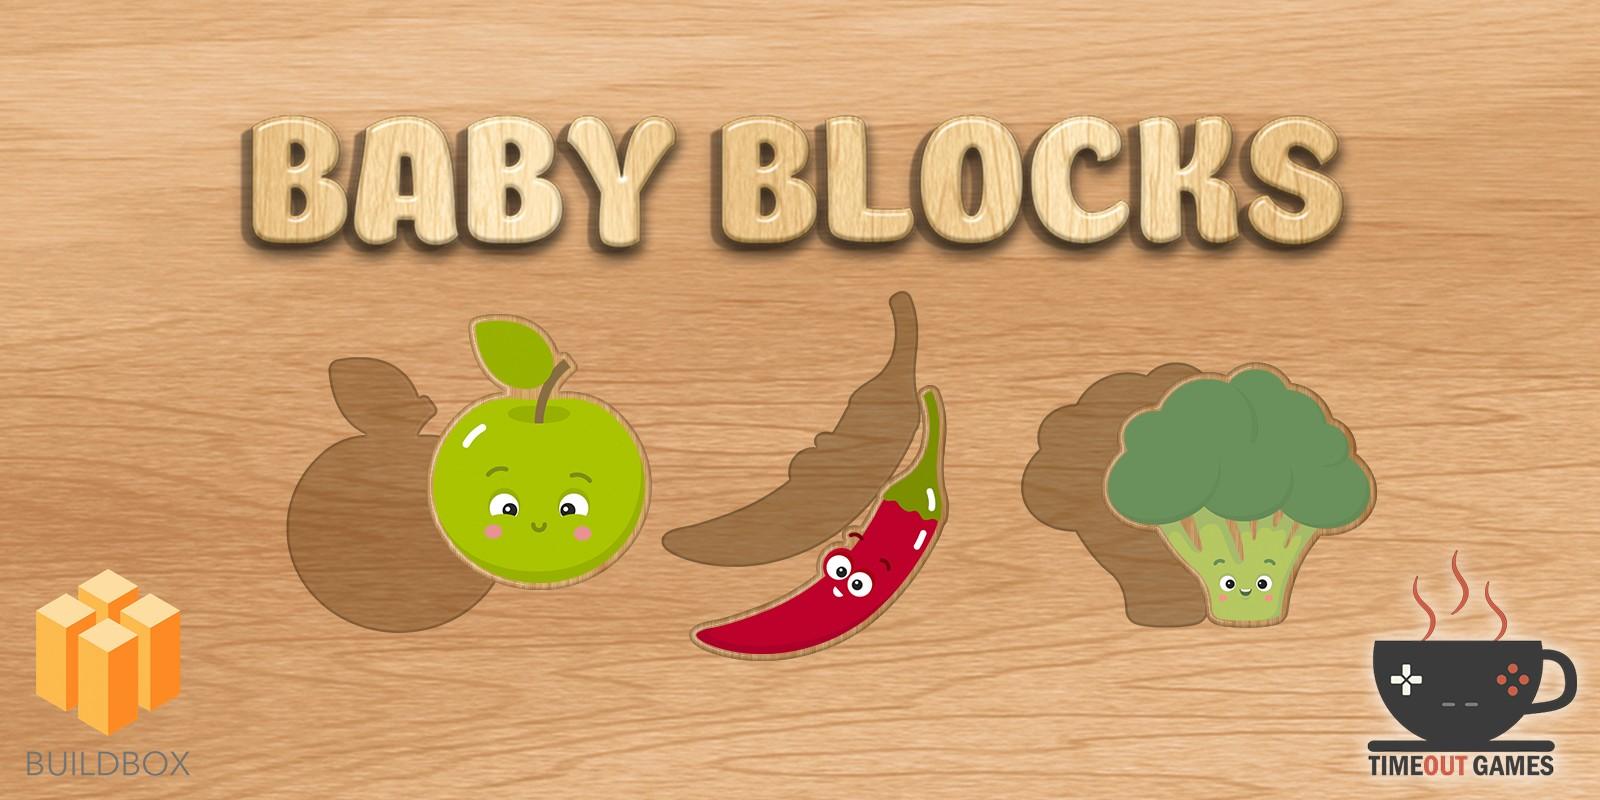 Baby Blocks - Full Buildbox Game